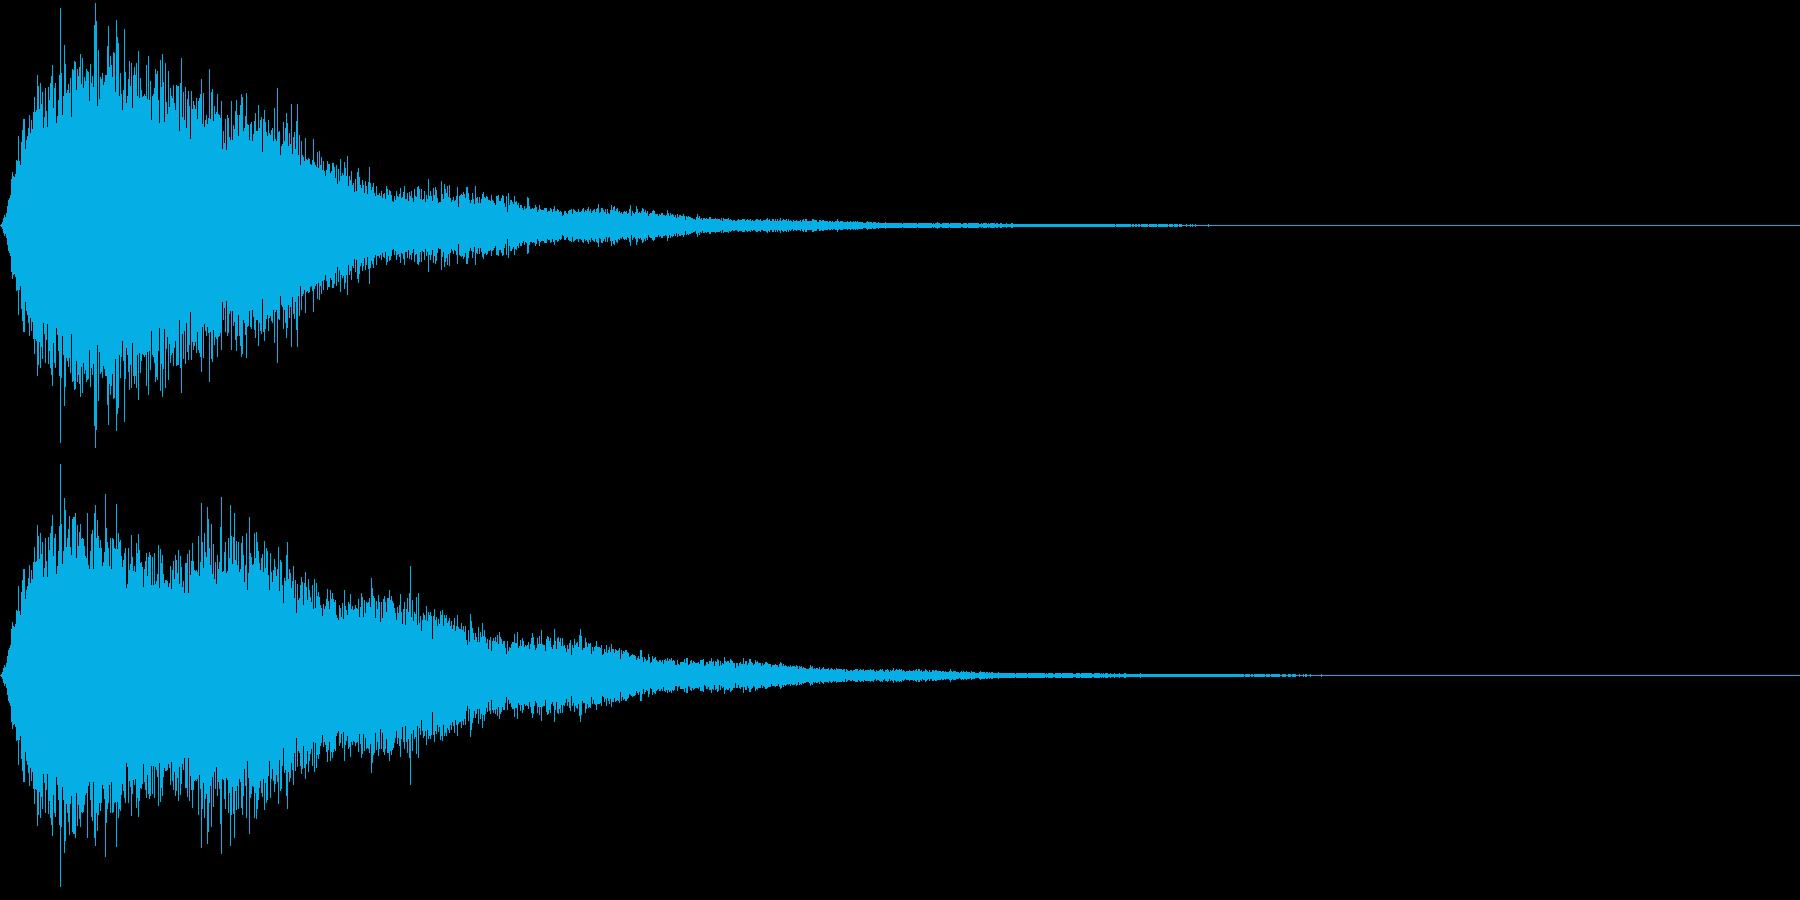 SE 一瞬の隙 攻撃 シャドー 落下にもの再生済みの波形